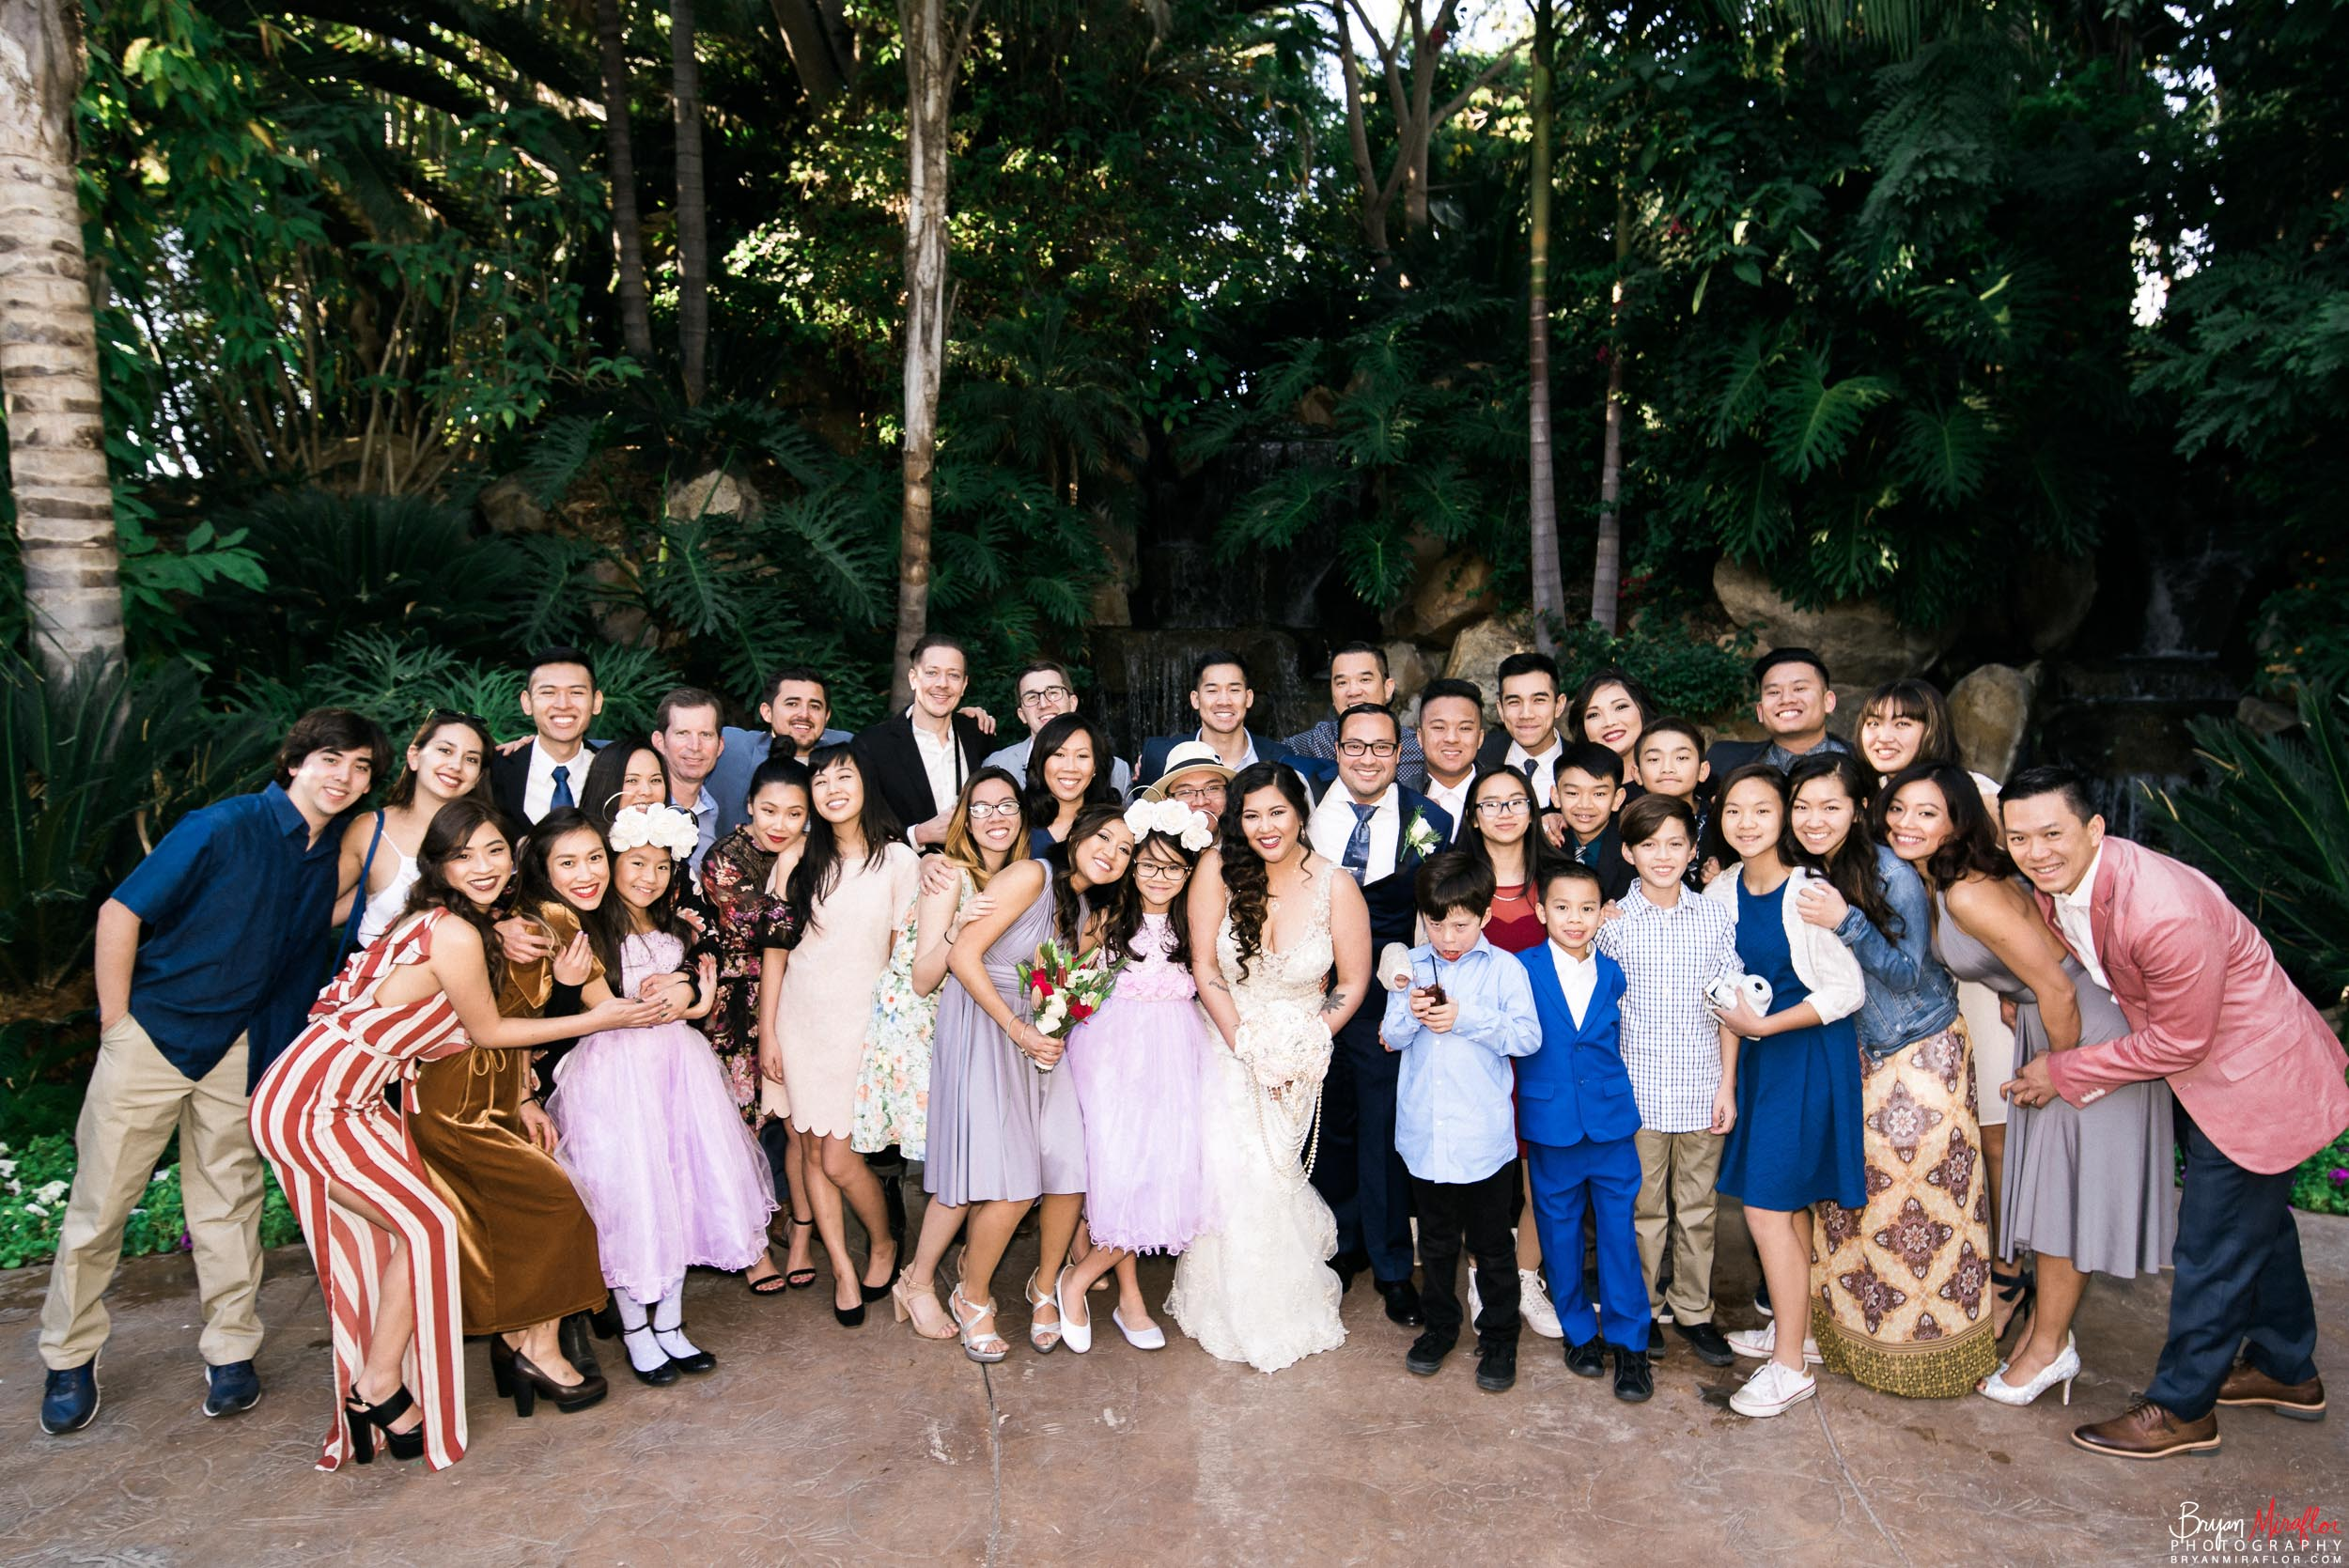 Bryan-Miraflor-Photography-Hannah-Jonathan-Married-Grand-Traditions-Estate-Gardens-Fallbrook-20171222-145.jpg